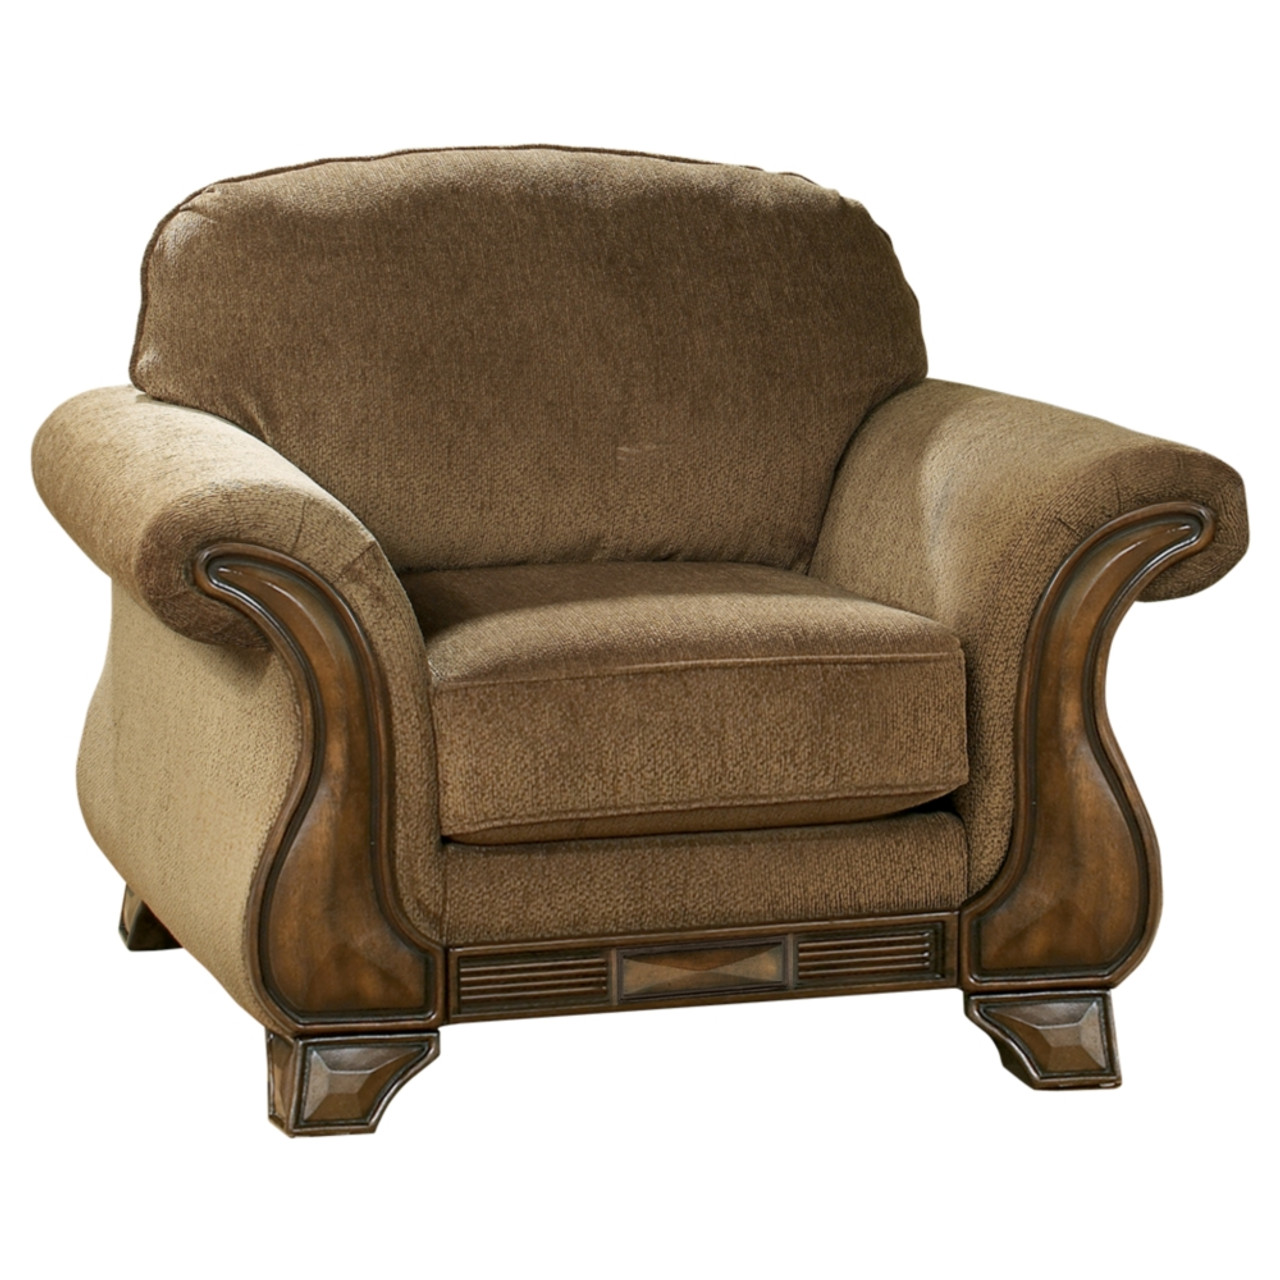 Fine Montgomery Mocha Chair Download Free Architecture Designs Intelgarnamadebymaigaardcom